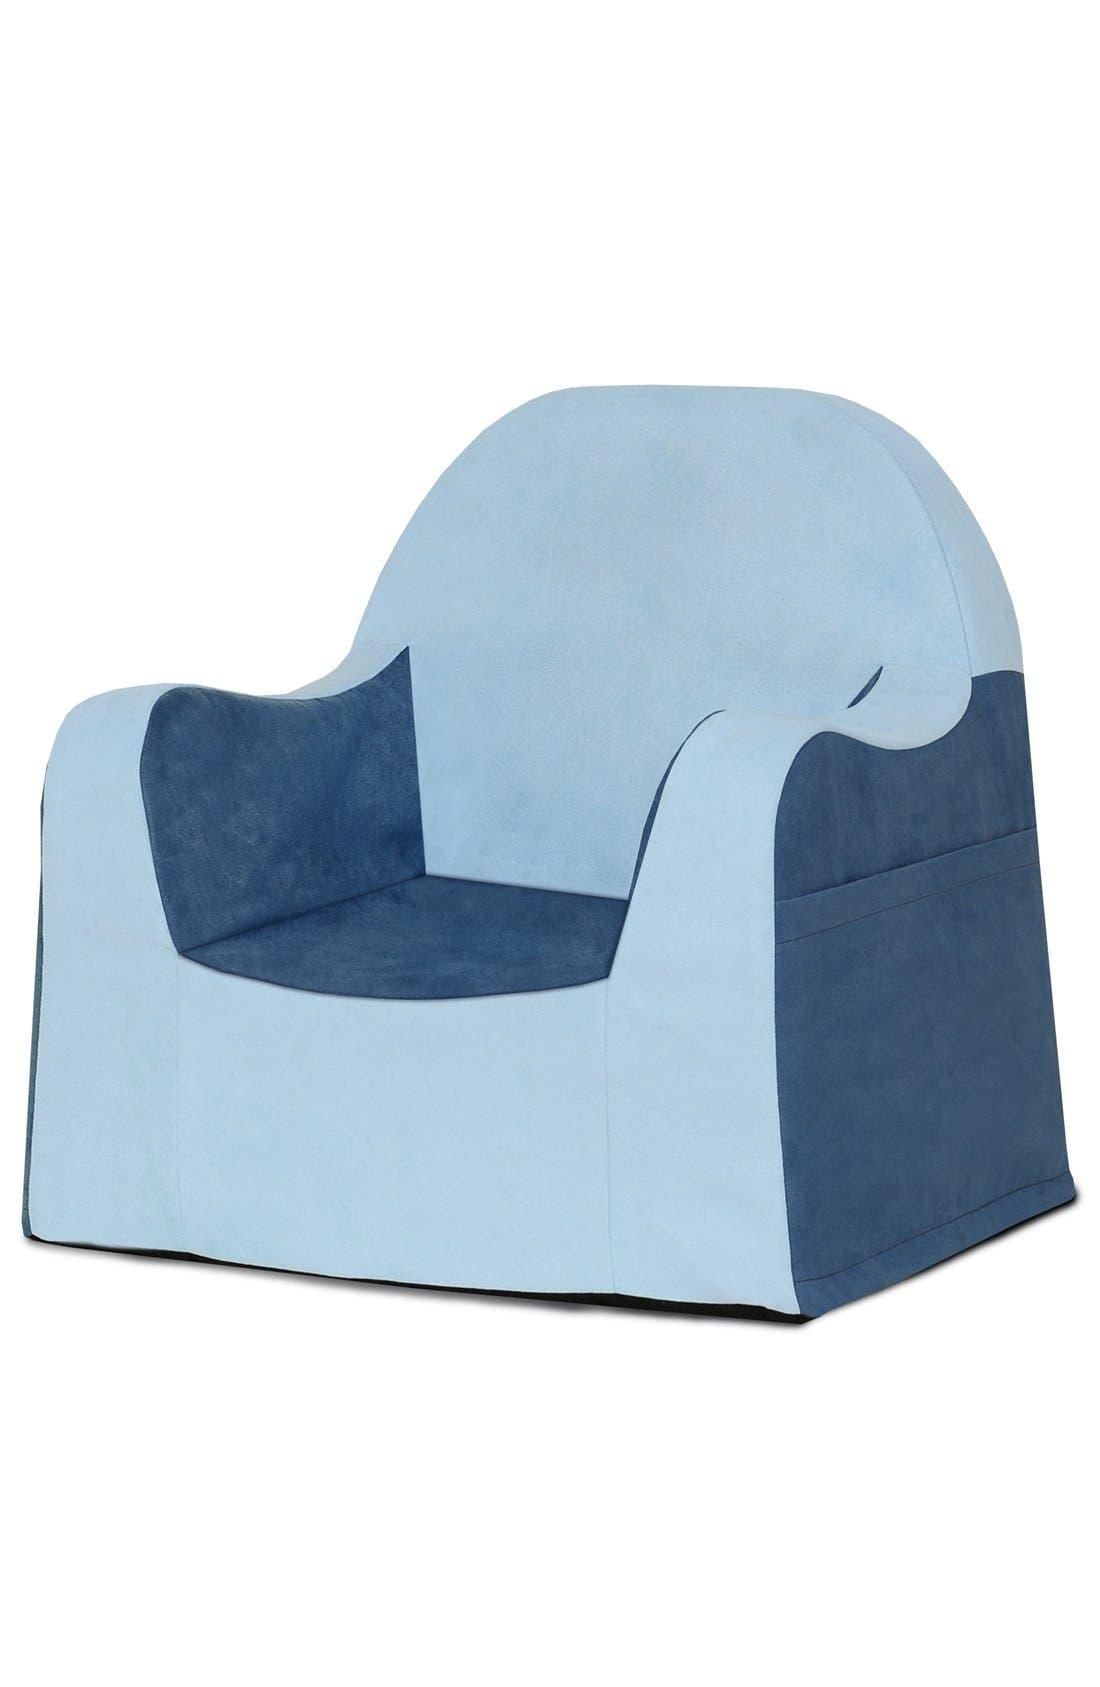 Alternate Image 3  - P'kolino 'Personalized Little Reader' Chair (Toddler)